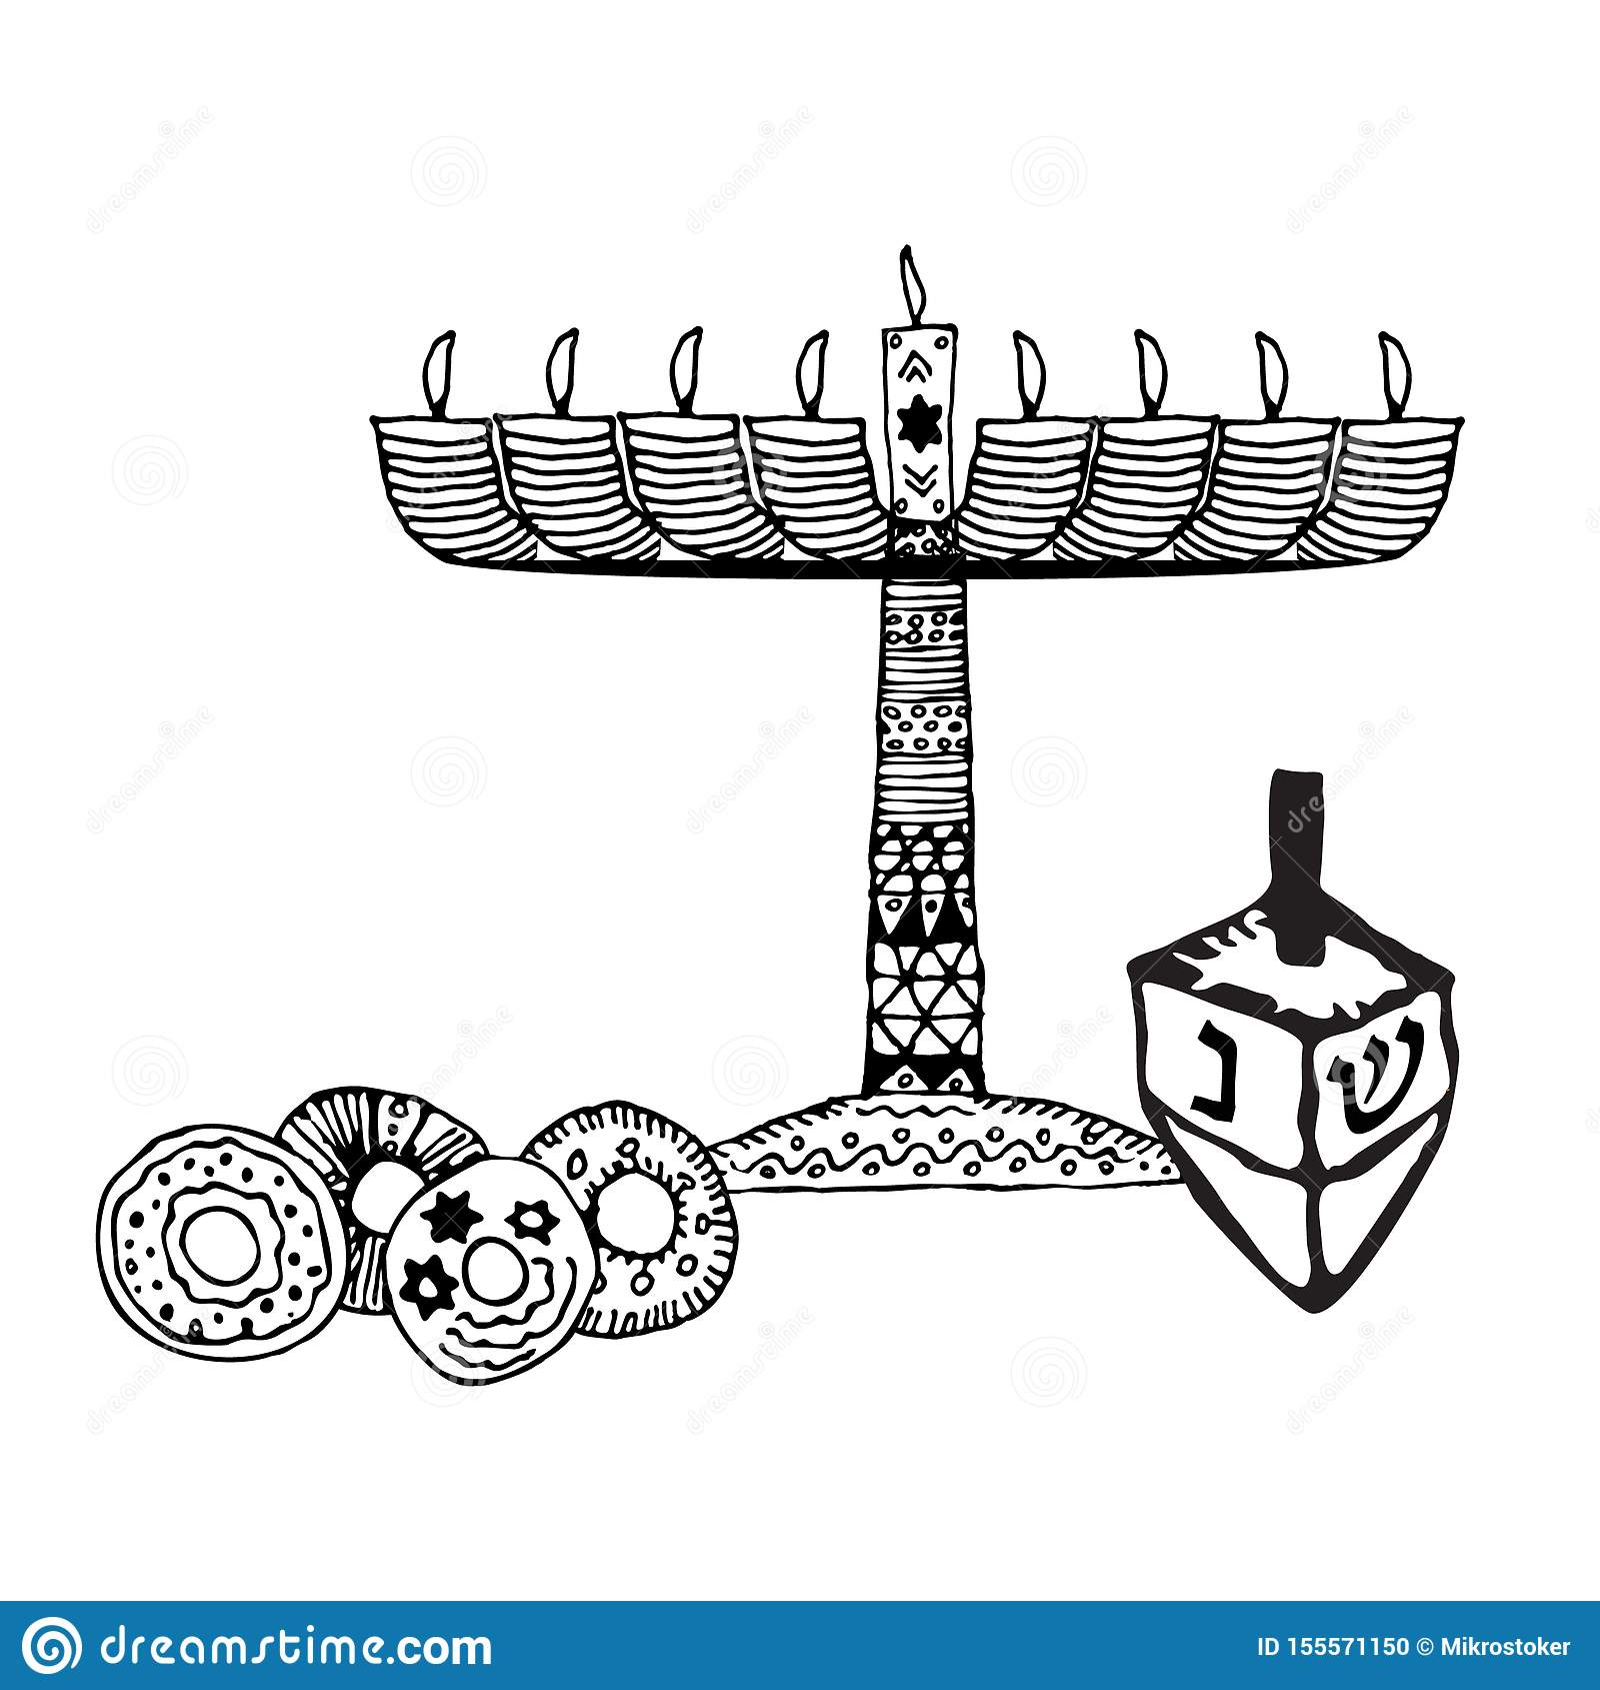 Chanukah蜡烛,sevivon,油炸圈饼 乱画,剪影,凹道手 犹太宗教节光明节 西伯来信件